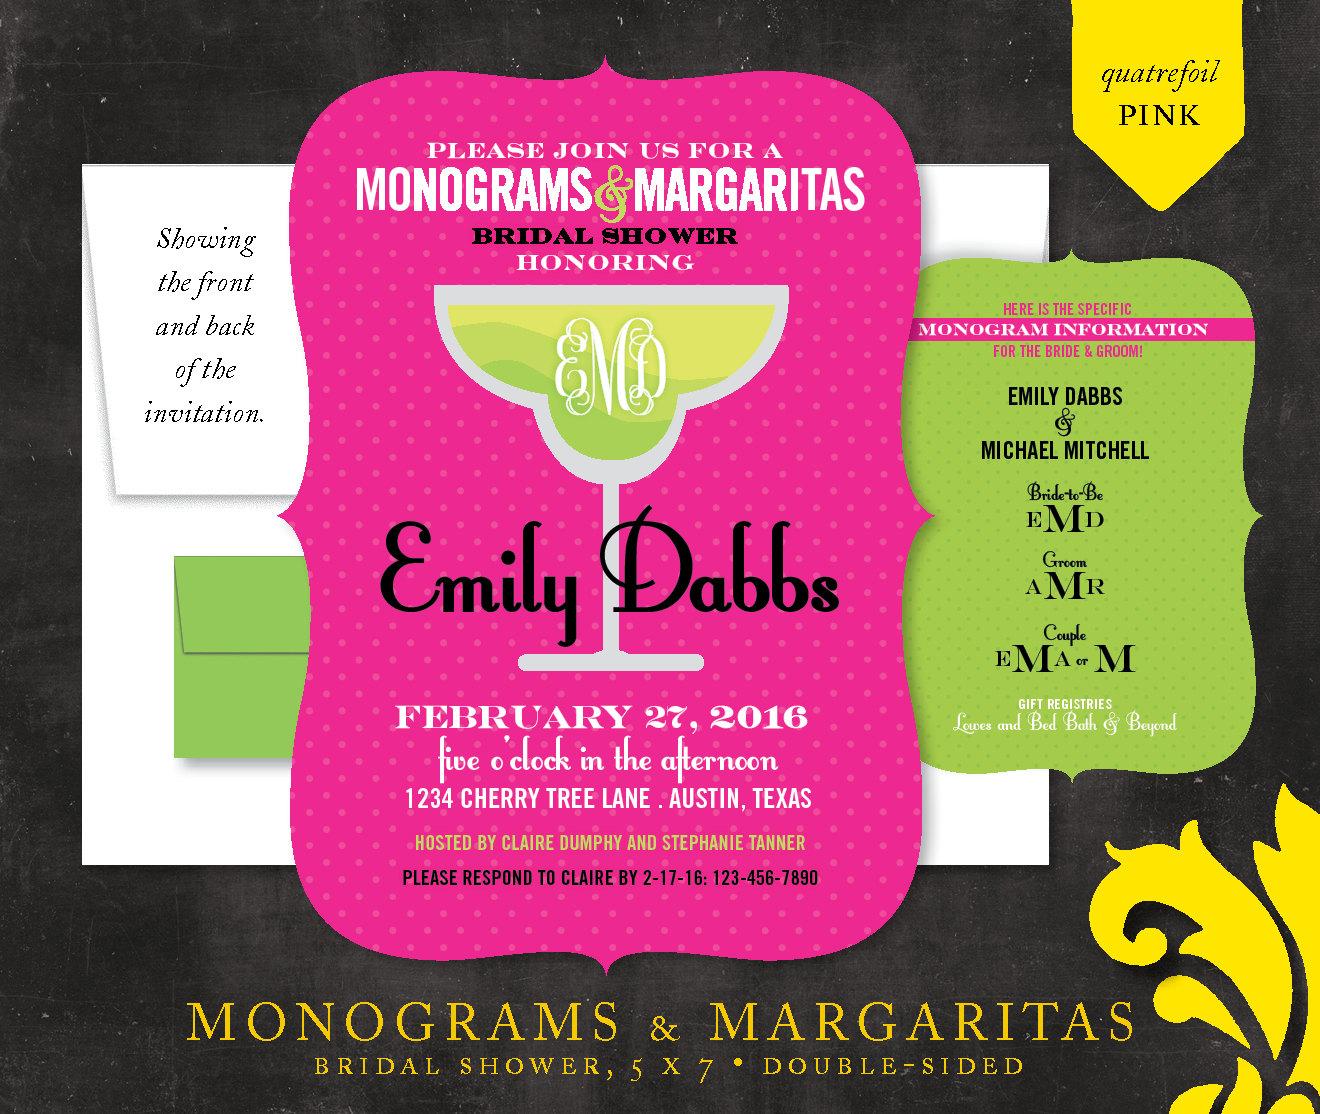 MONOGRAMS & MARGARITAS . bridal shower invitation | Etsy